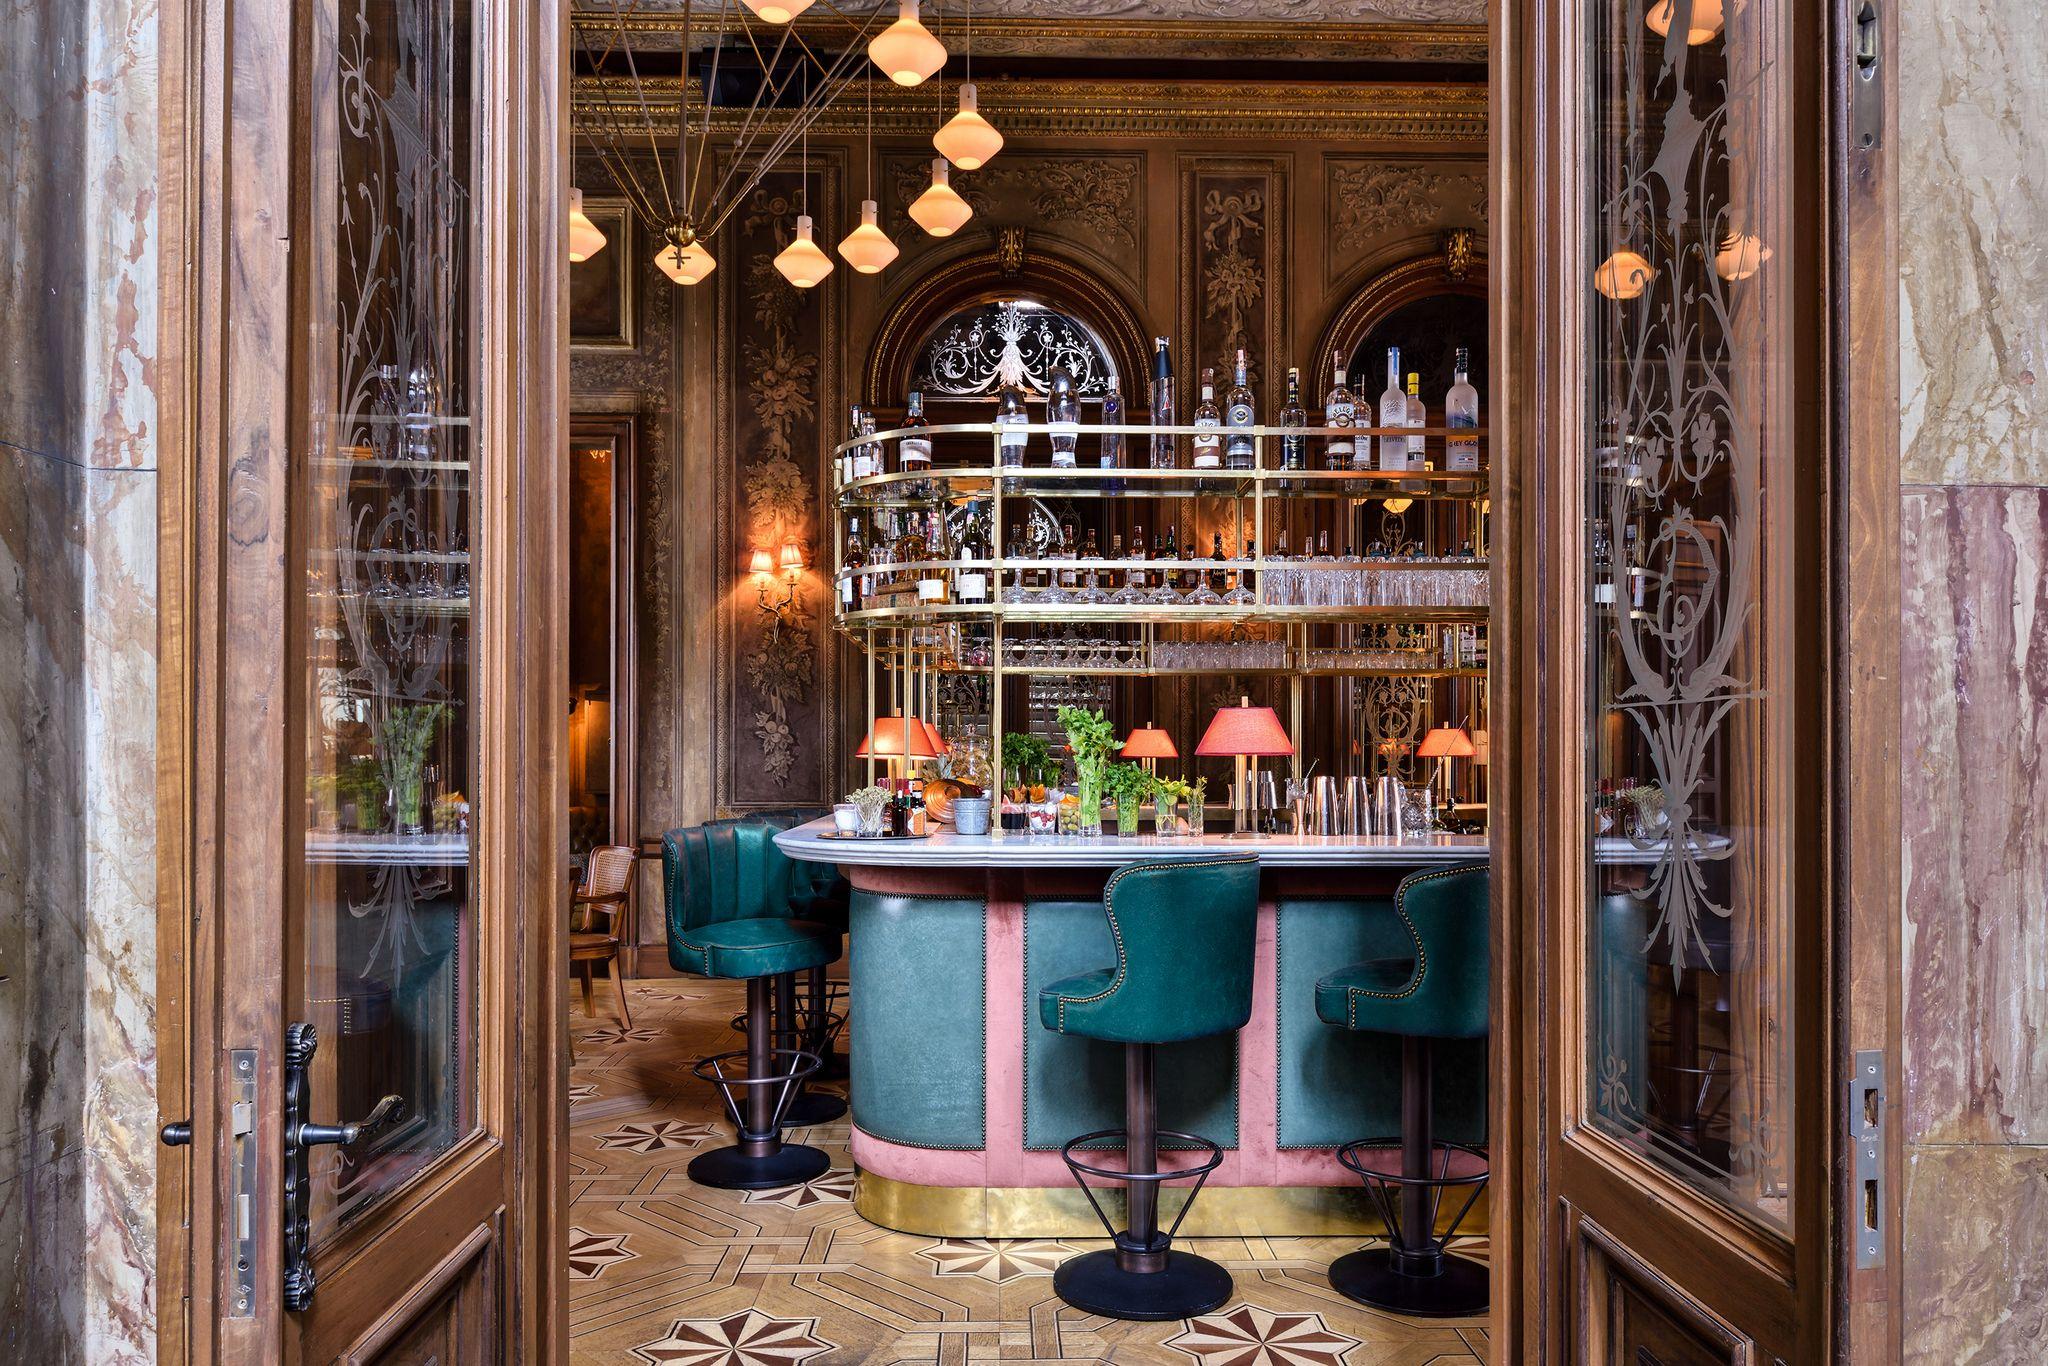 soho house istanbul kul p hotel chic pinterest soho house istanbul soho house and soho. Black Bedroom Furniture Sets. Home Design Ideas